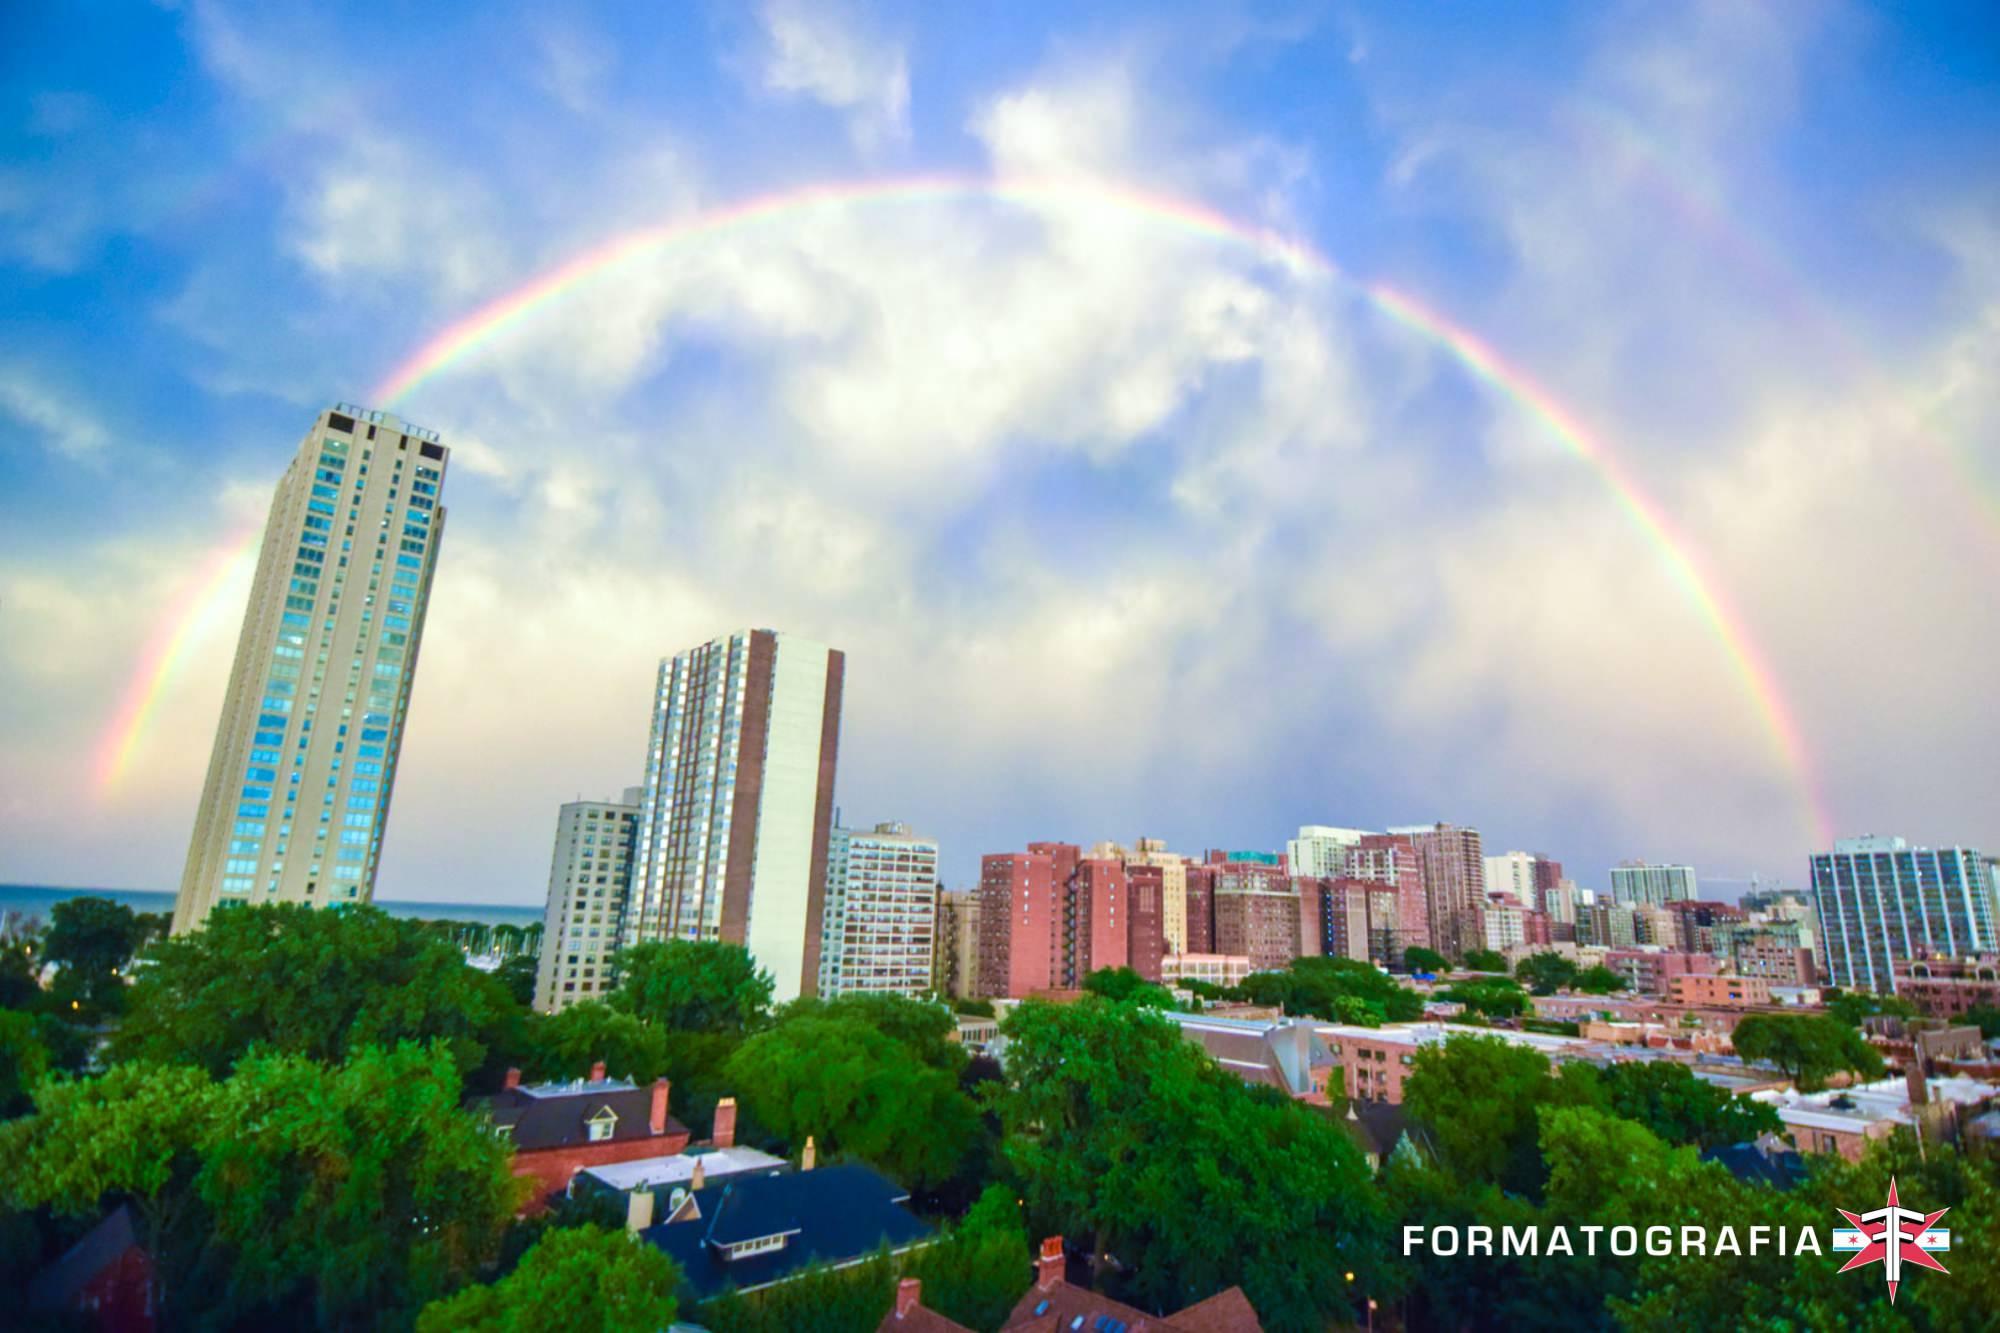 eric formato chicago photographer fall update city architecture shotsDSC_0479-4.jpg